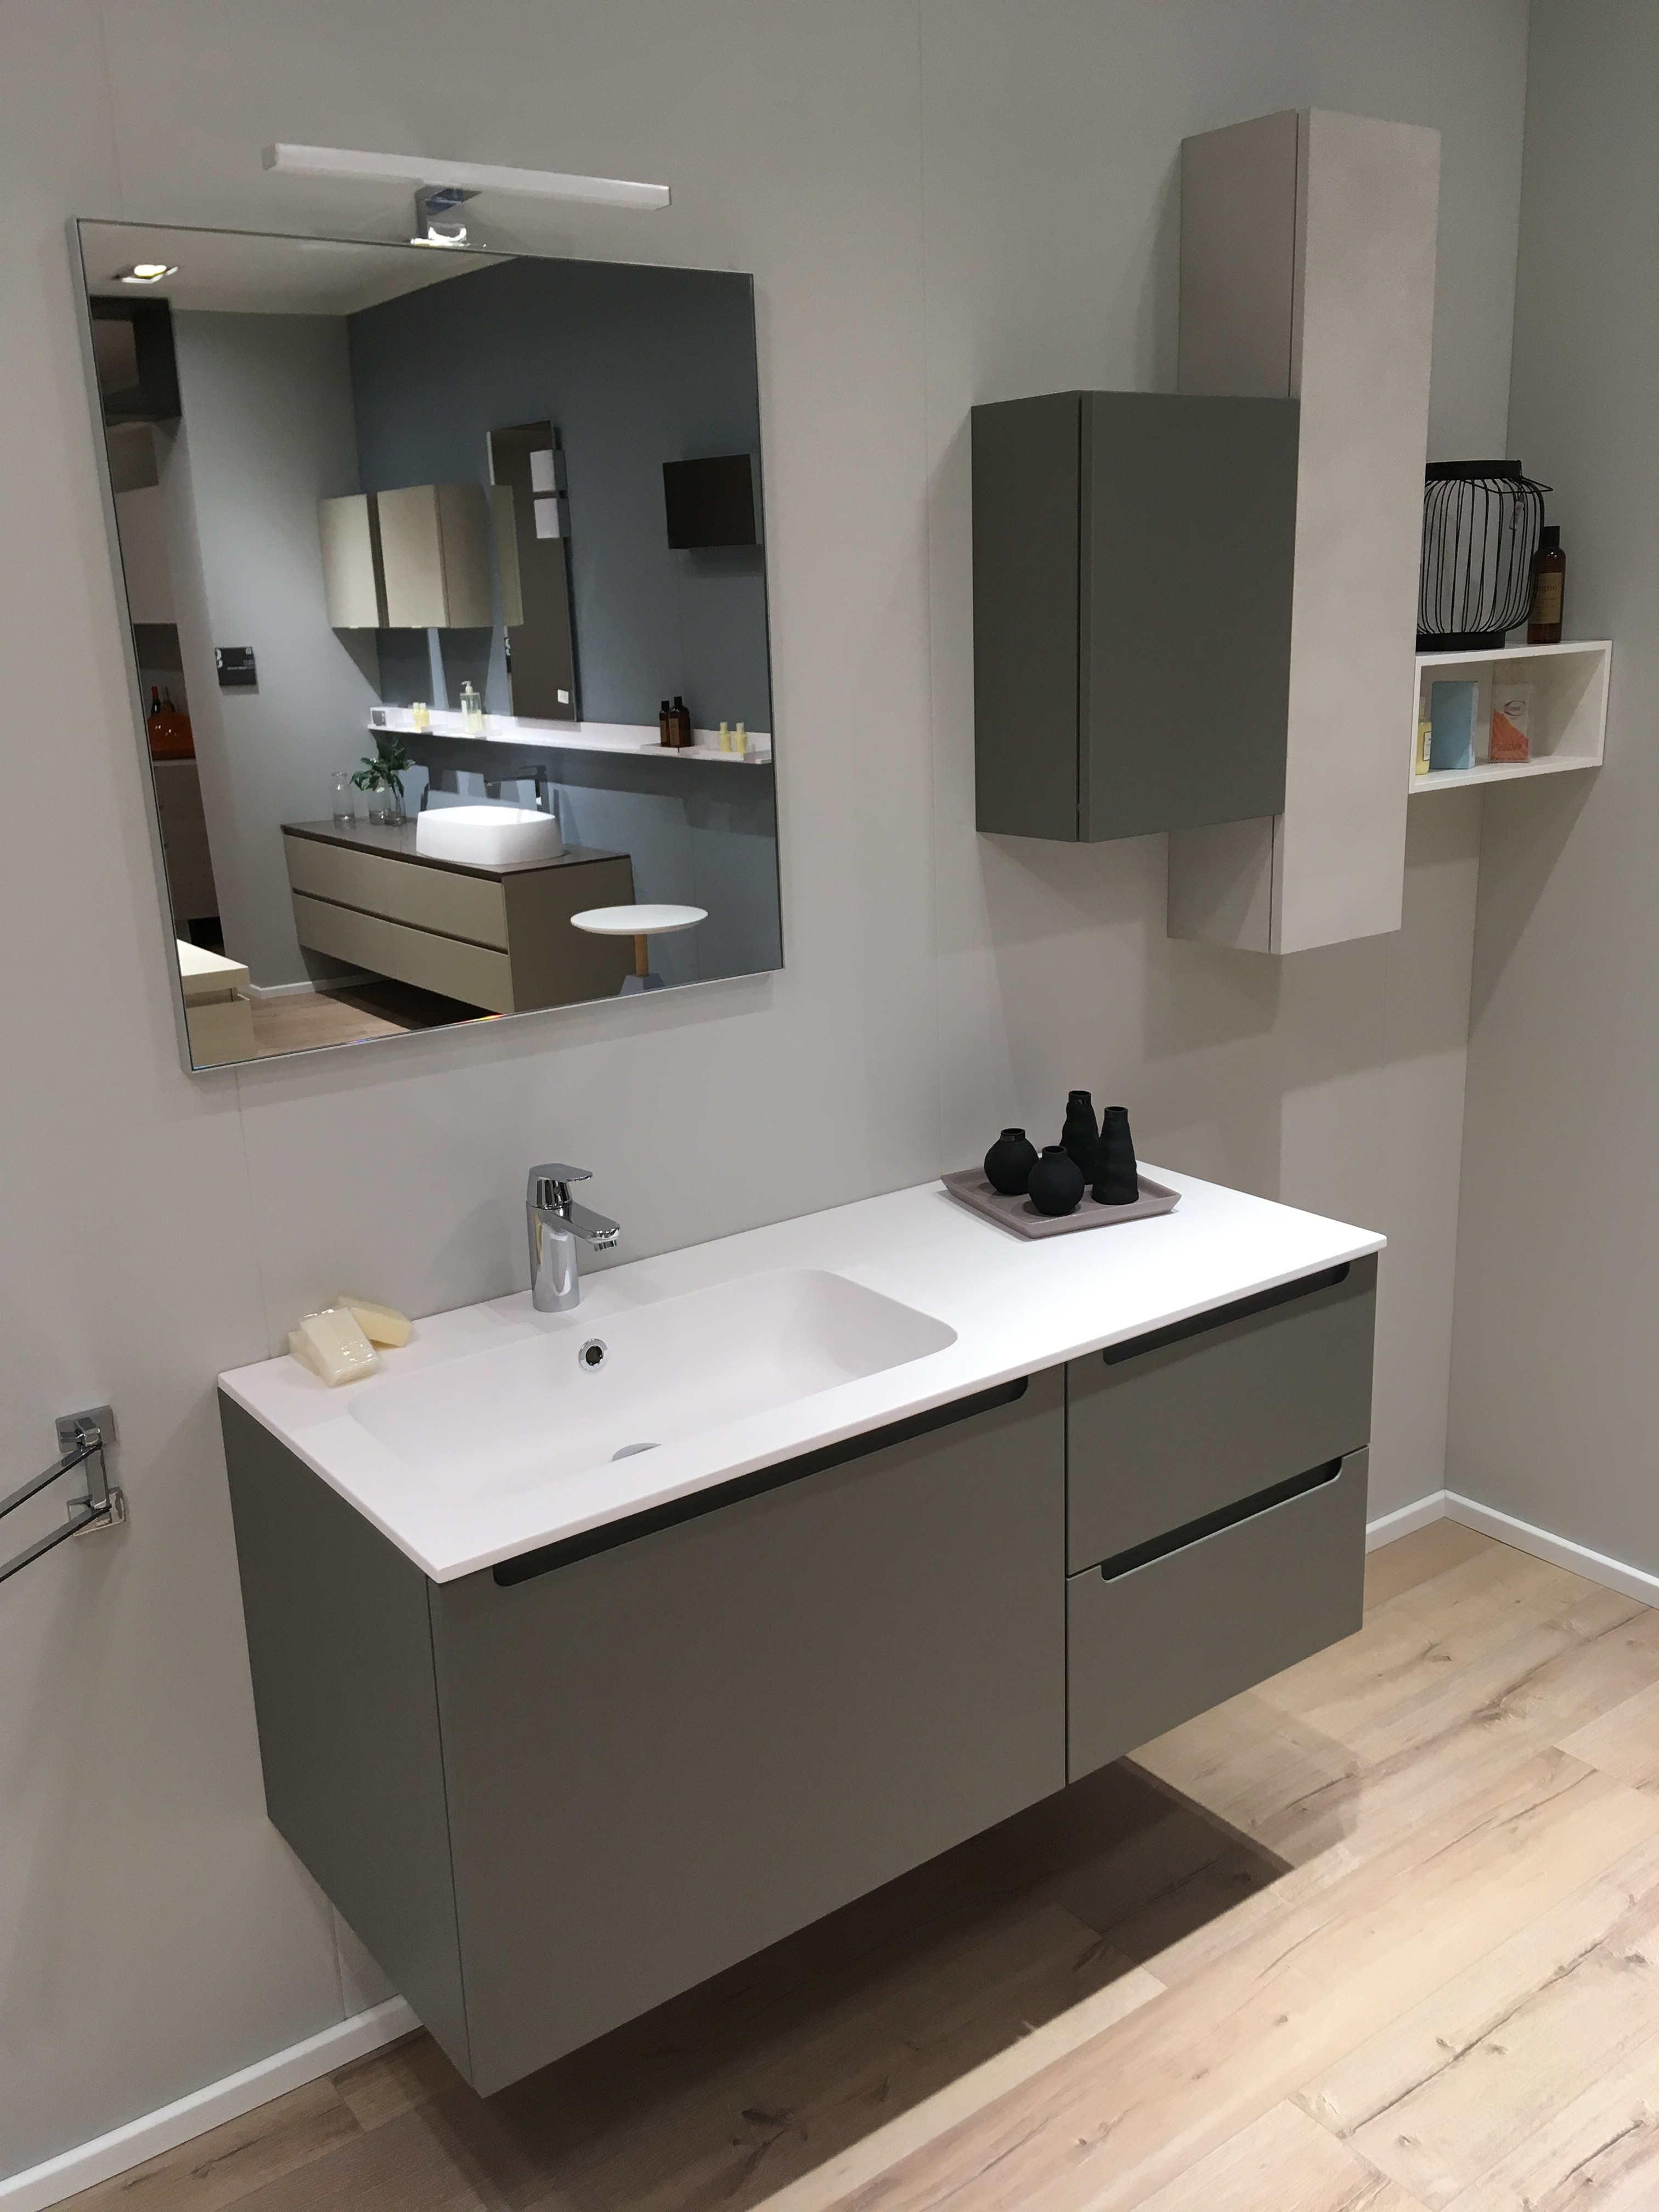 Scavolini bathrooms arredo bagno scavolini mod idro for Arredo bagno scavolini